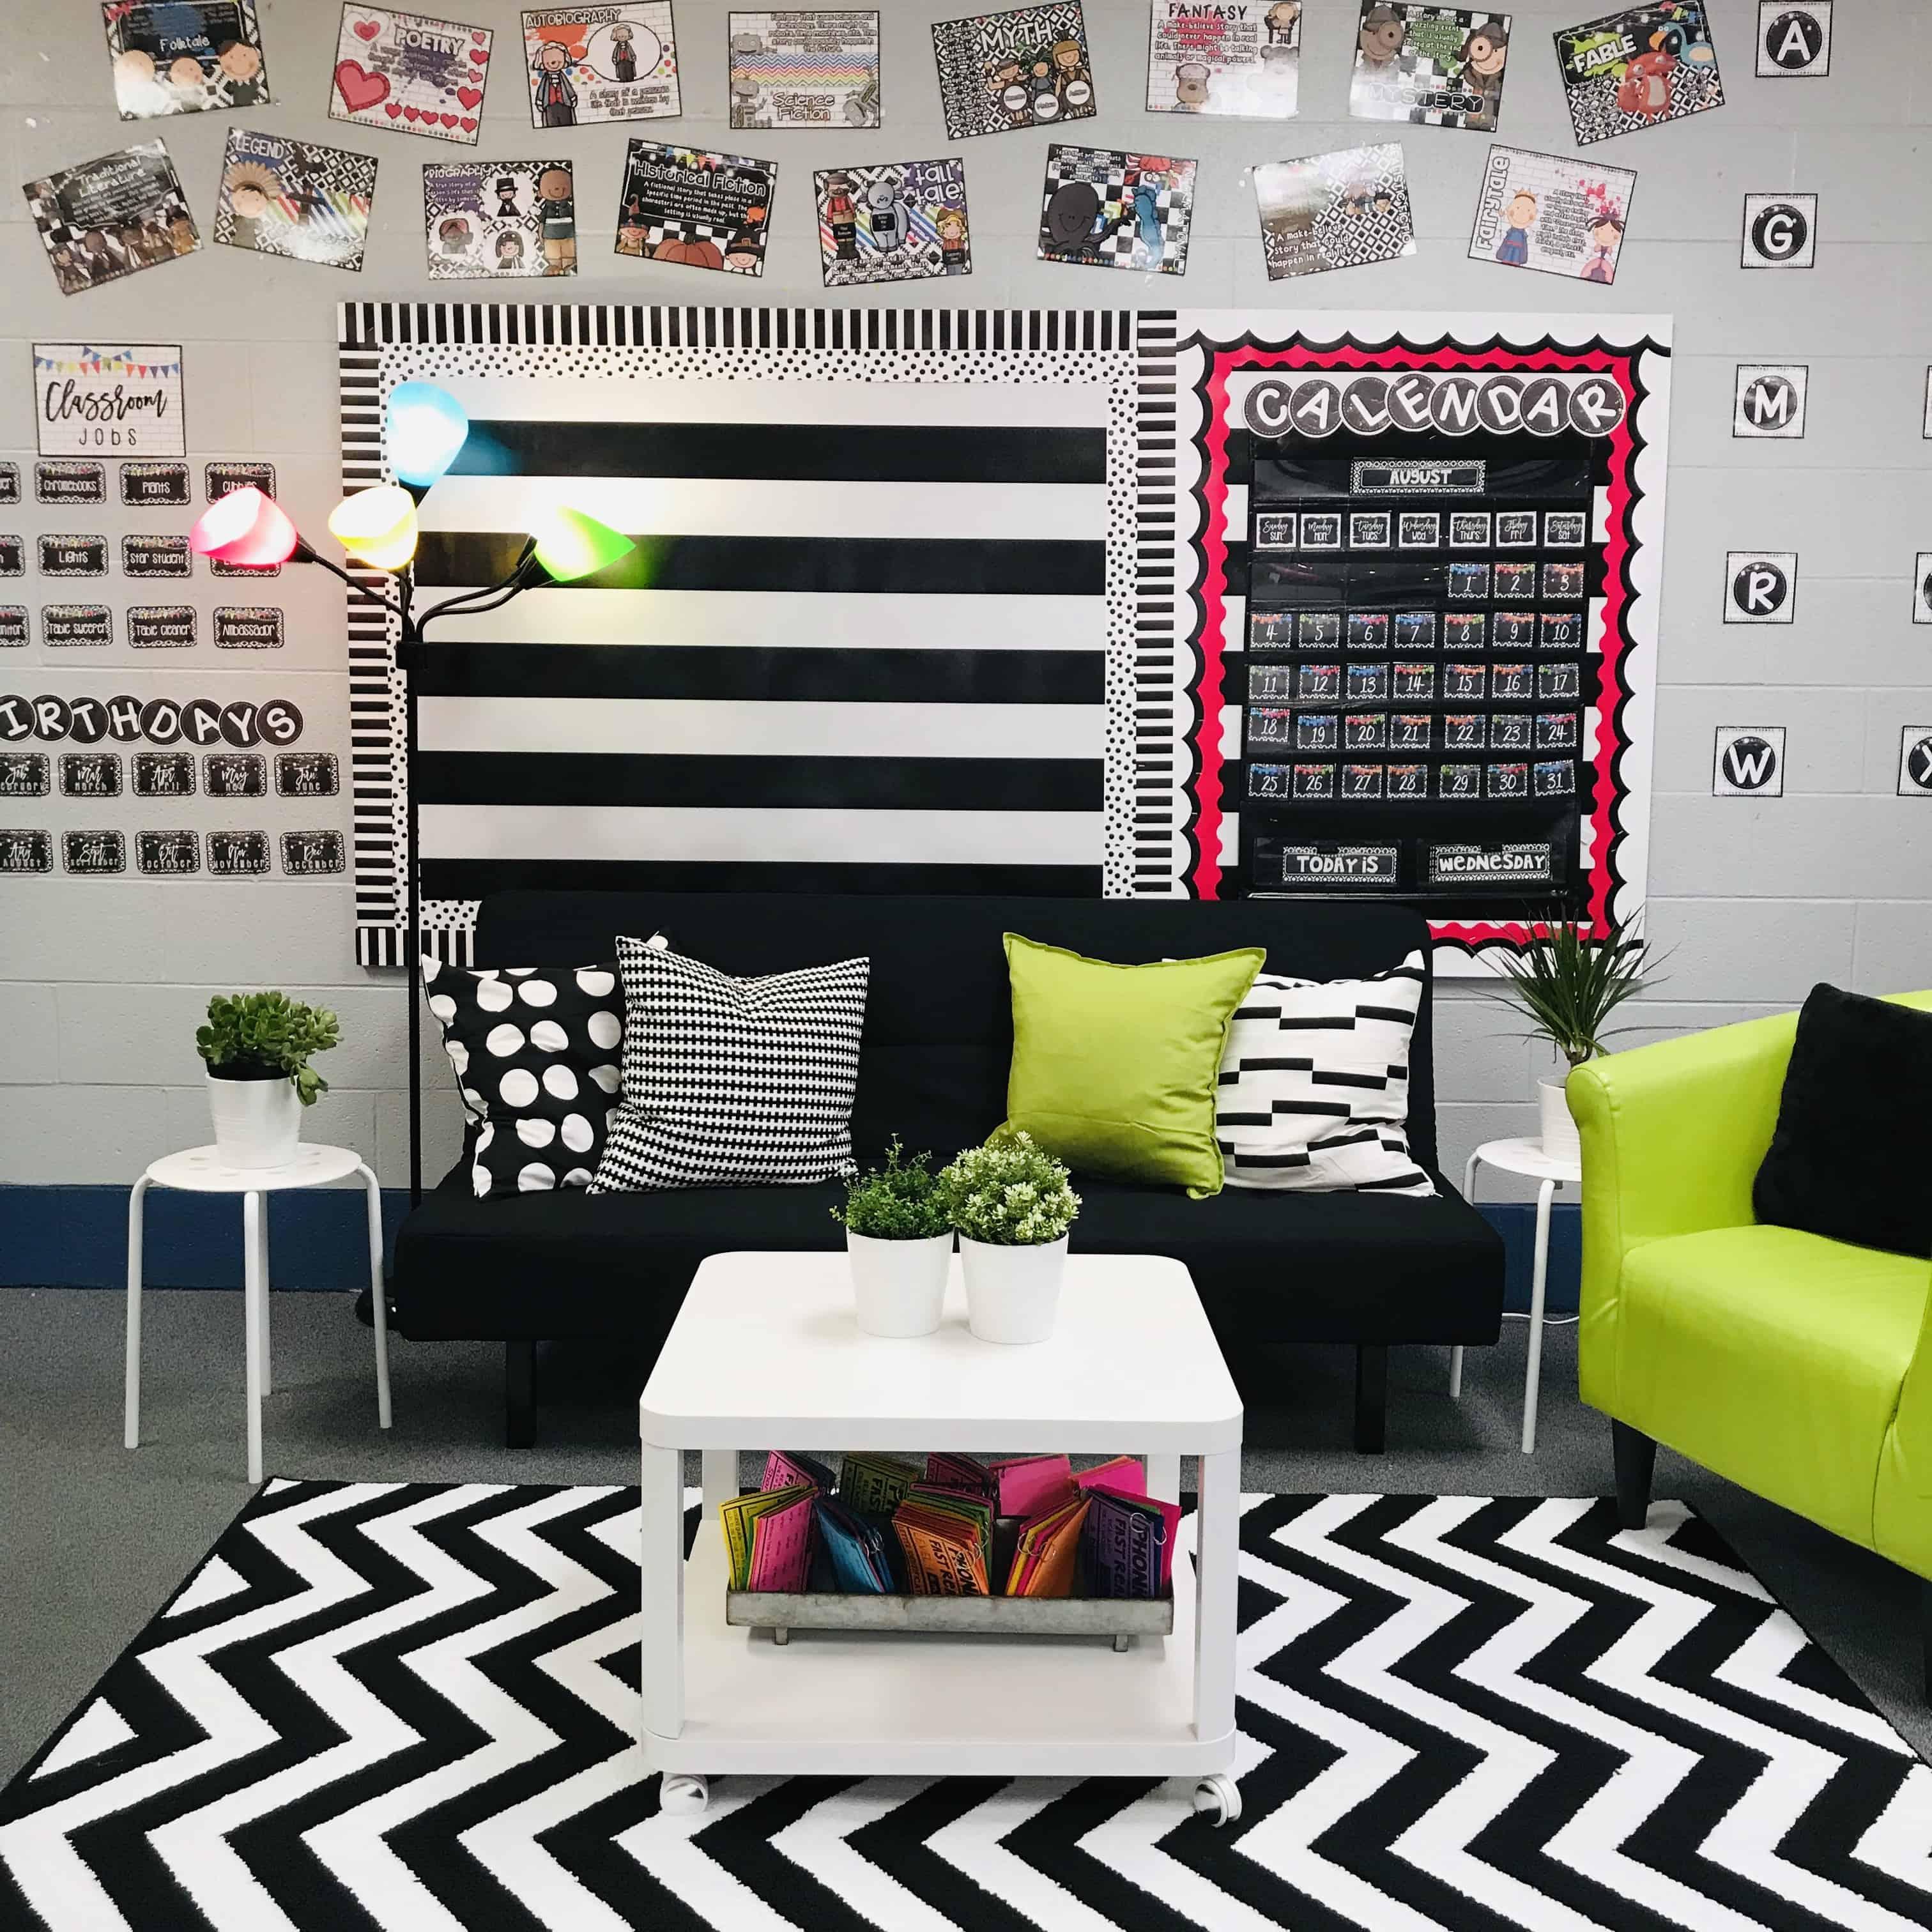 Classroom Reveal | Farmhouse Flair Neon Tile Classroom Decor